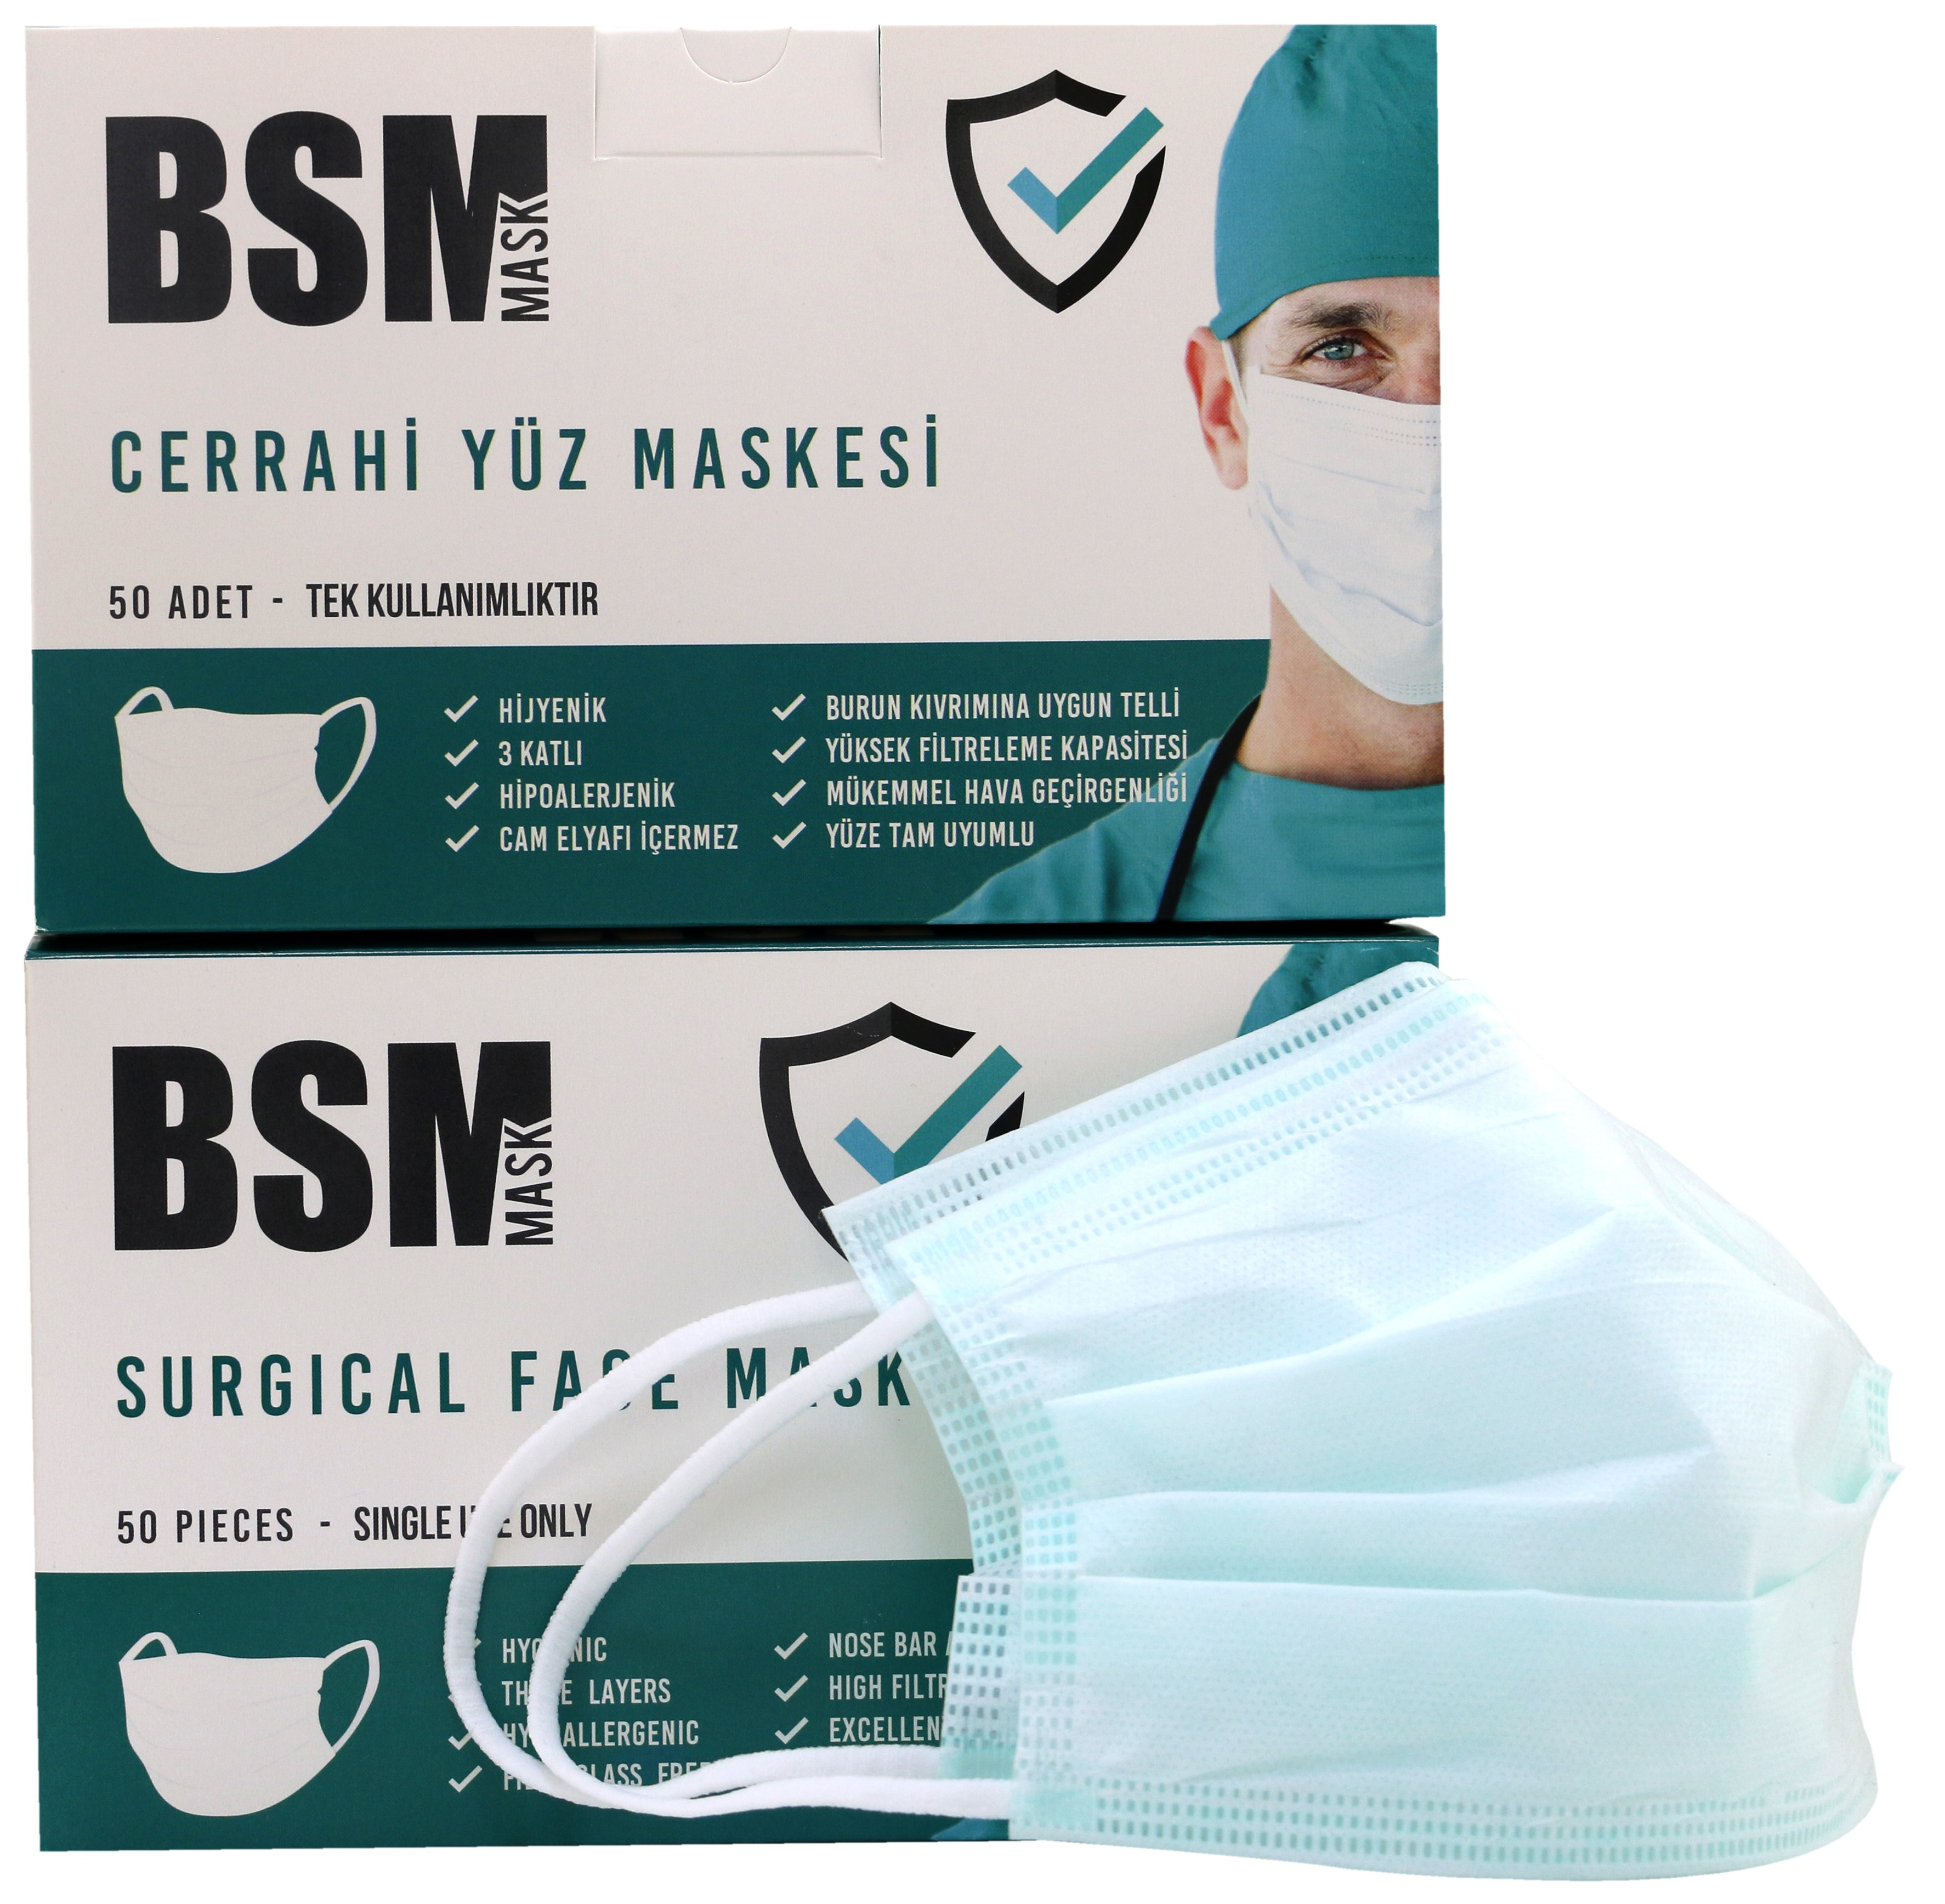 BSM YEŞİL 3 Katlı Yassı Lastikli MELTBLOWN Cerrahi Maske Toplam 100 Adet